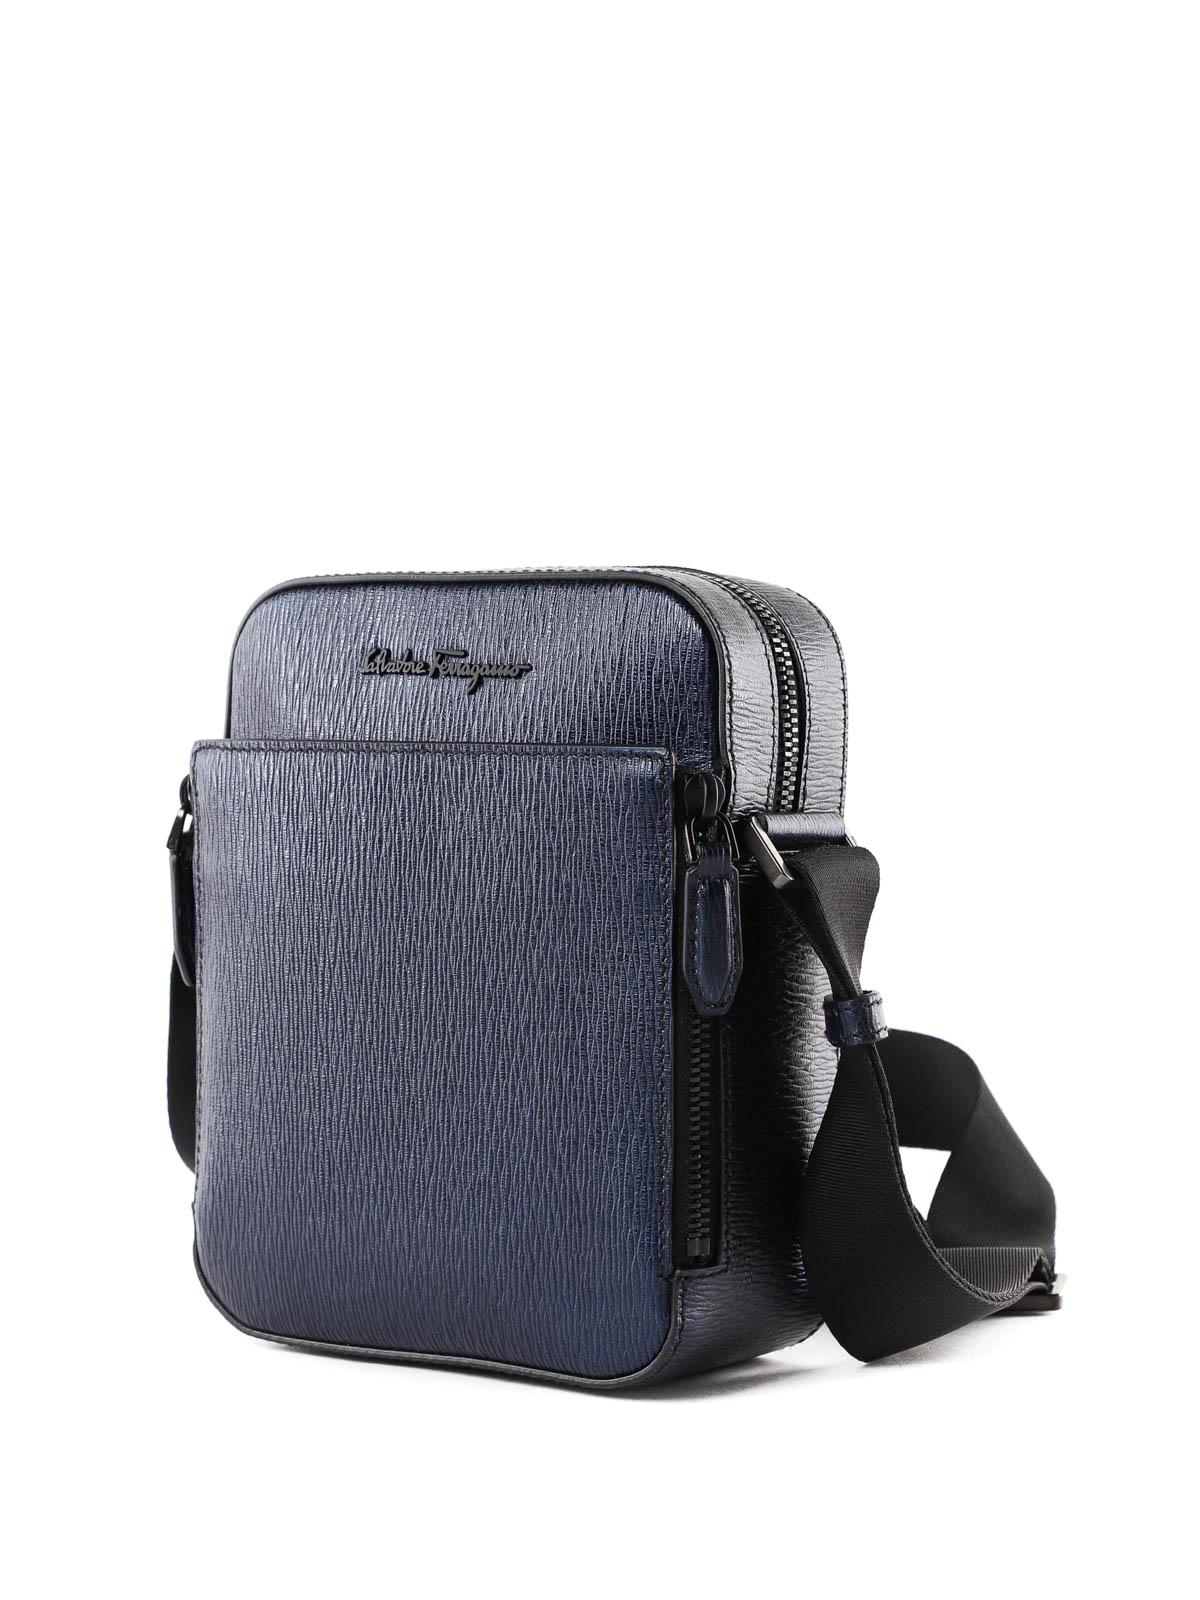 SALVATORE FERRAGAMO  cross body bags online - Dark blue leather crossbody  bag 6e3ffc6ac4b8a